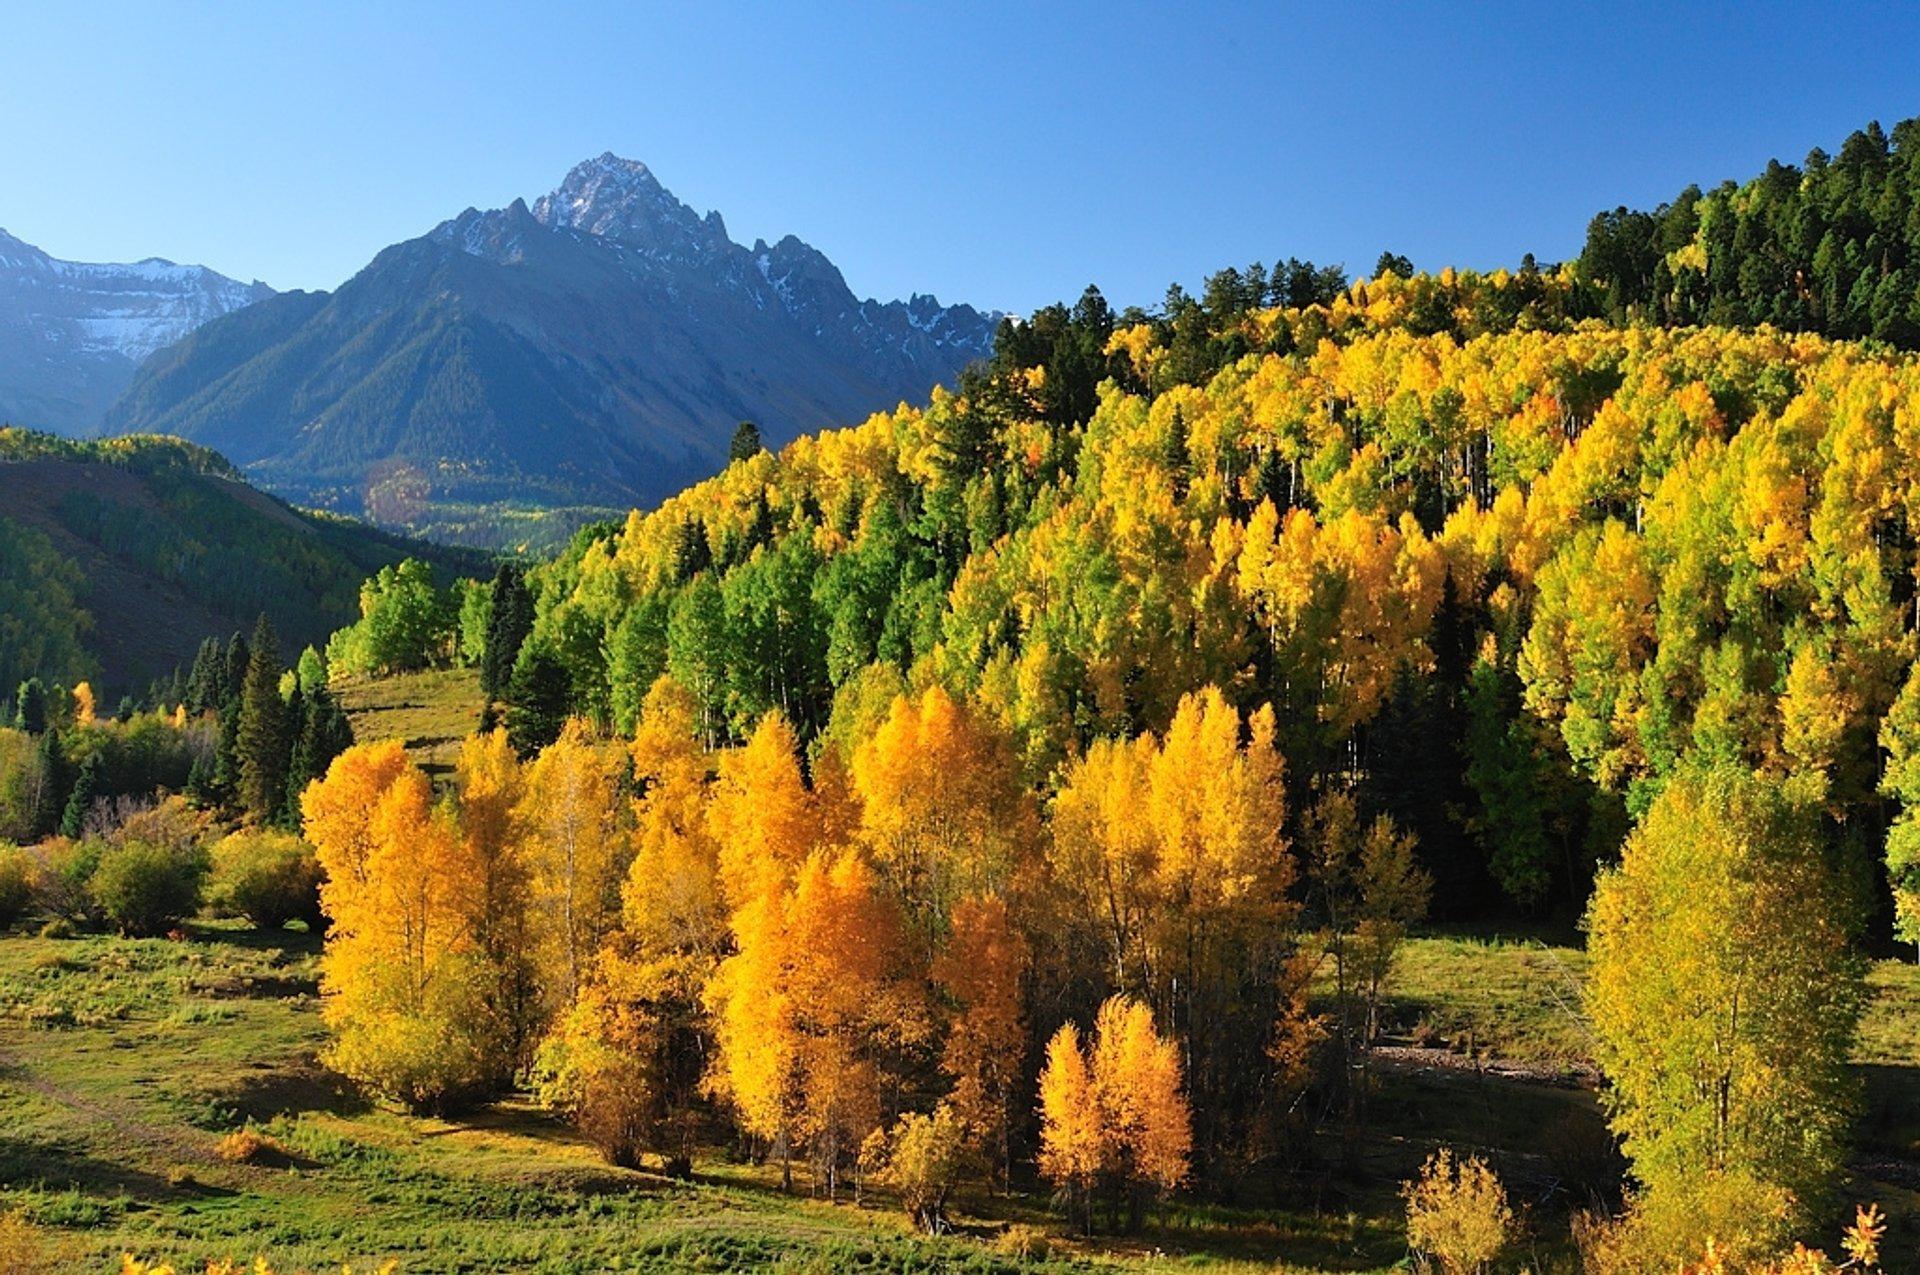 Colorado Fall Colors in Colorado 2019 - Best Time